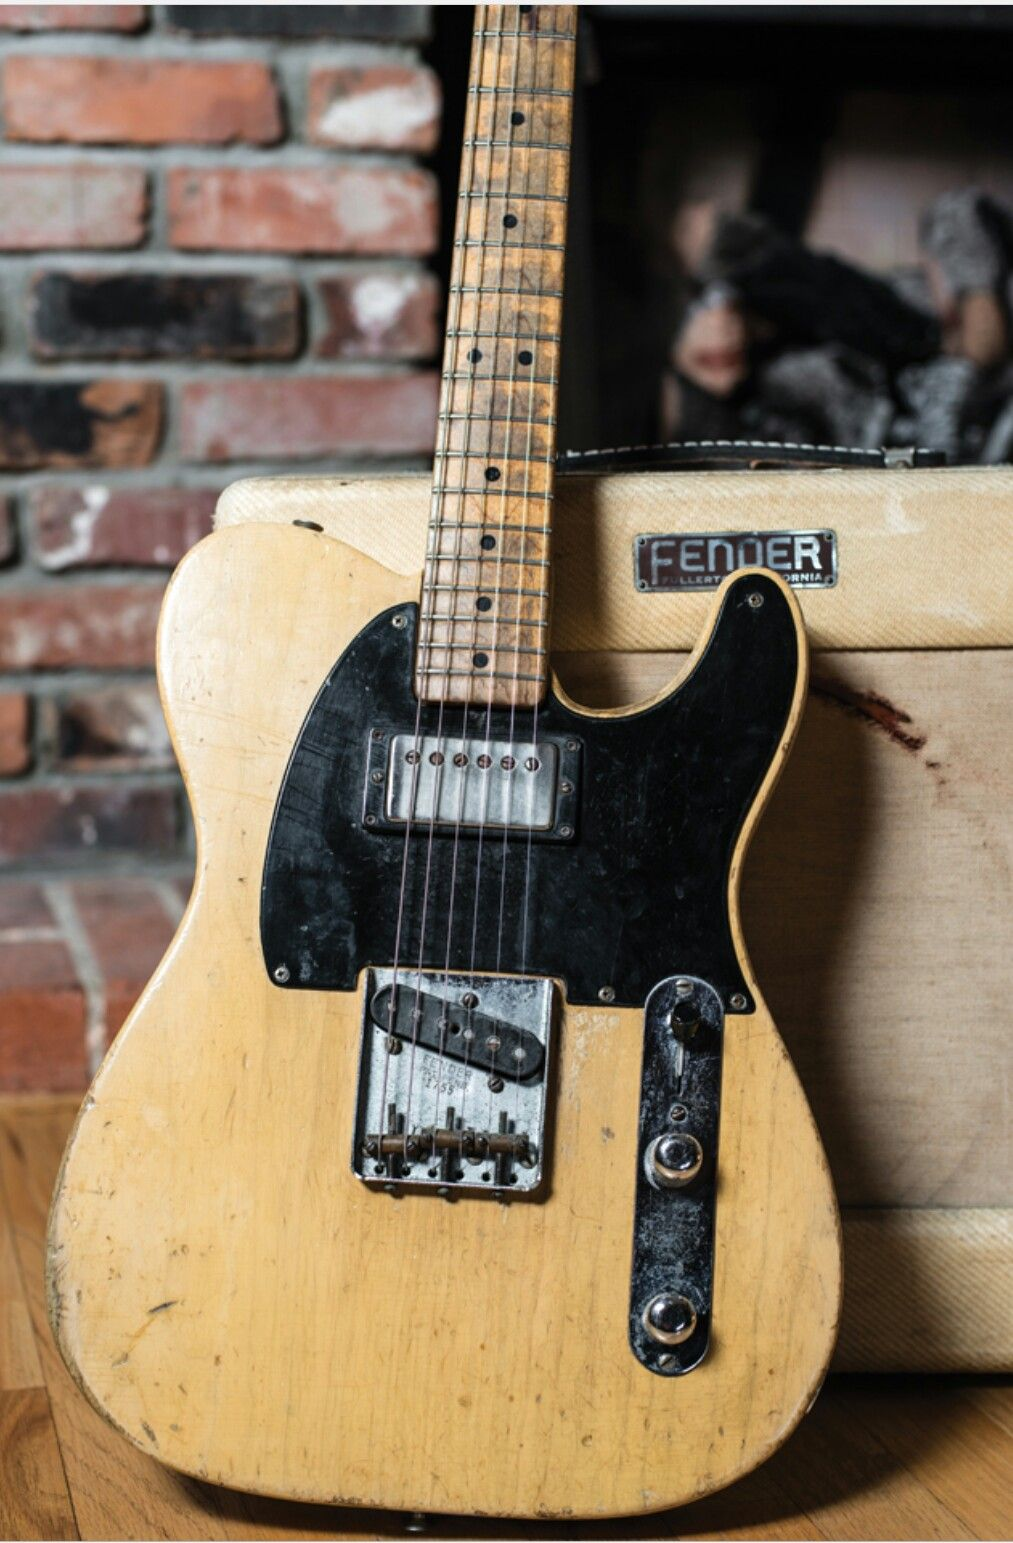 Joe Bonamassa 51 Nocaster 62 Gibson Paf Humbucker Fender Guitars Vintage Guitar Amps Fender Vintage